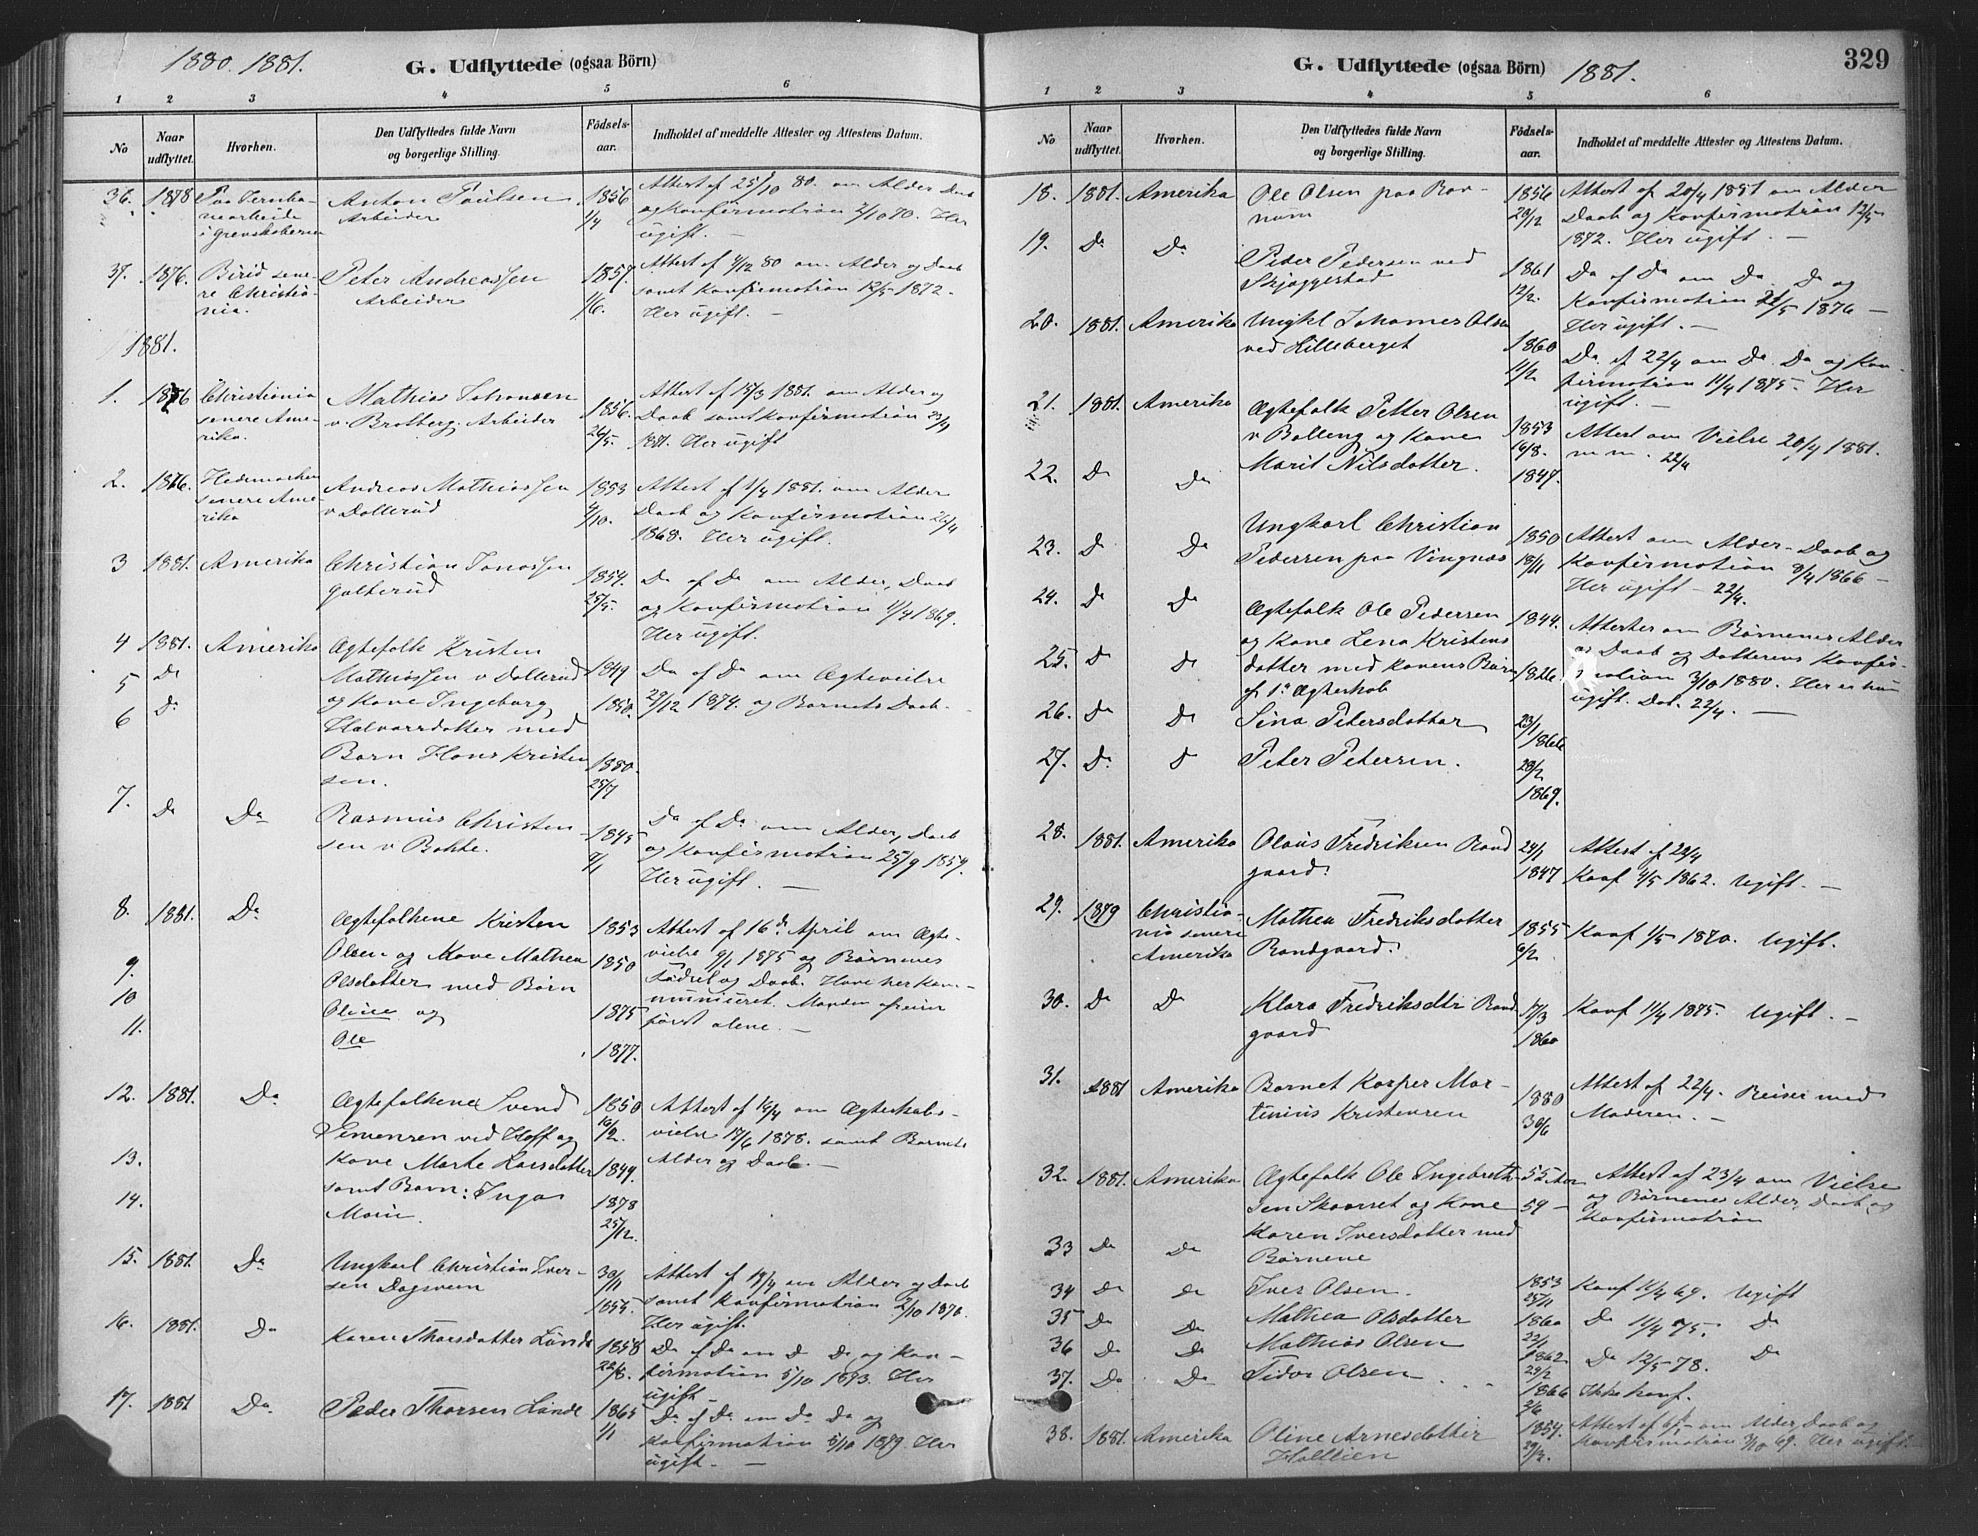 SAH, Fåberg prestekontor, Ministerialbok nr. 9, 1879-1898, s. 329